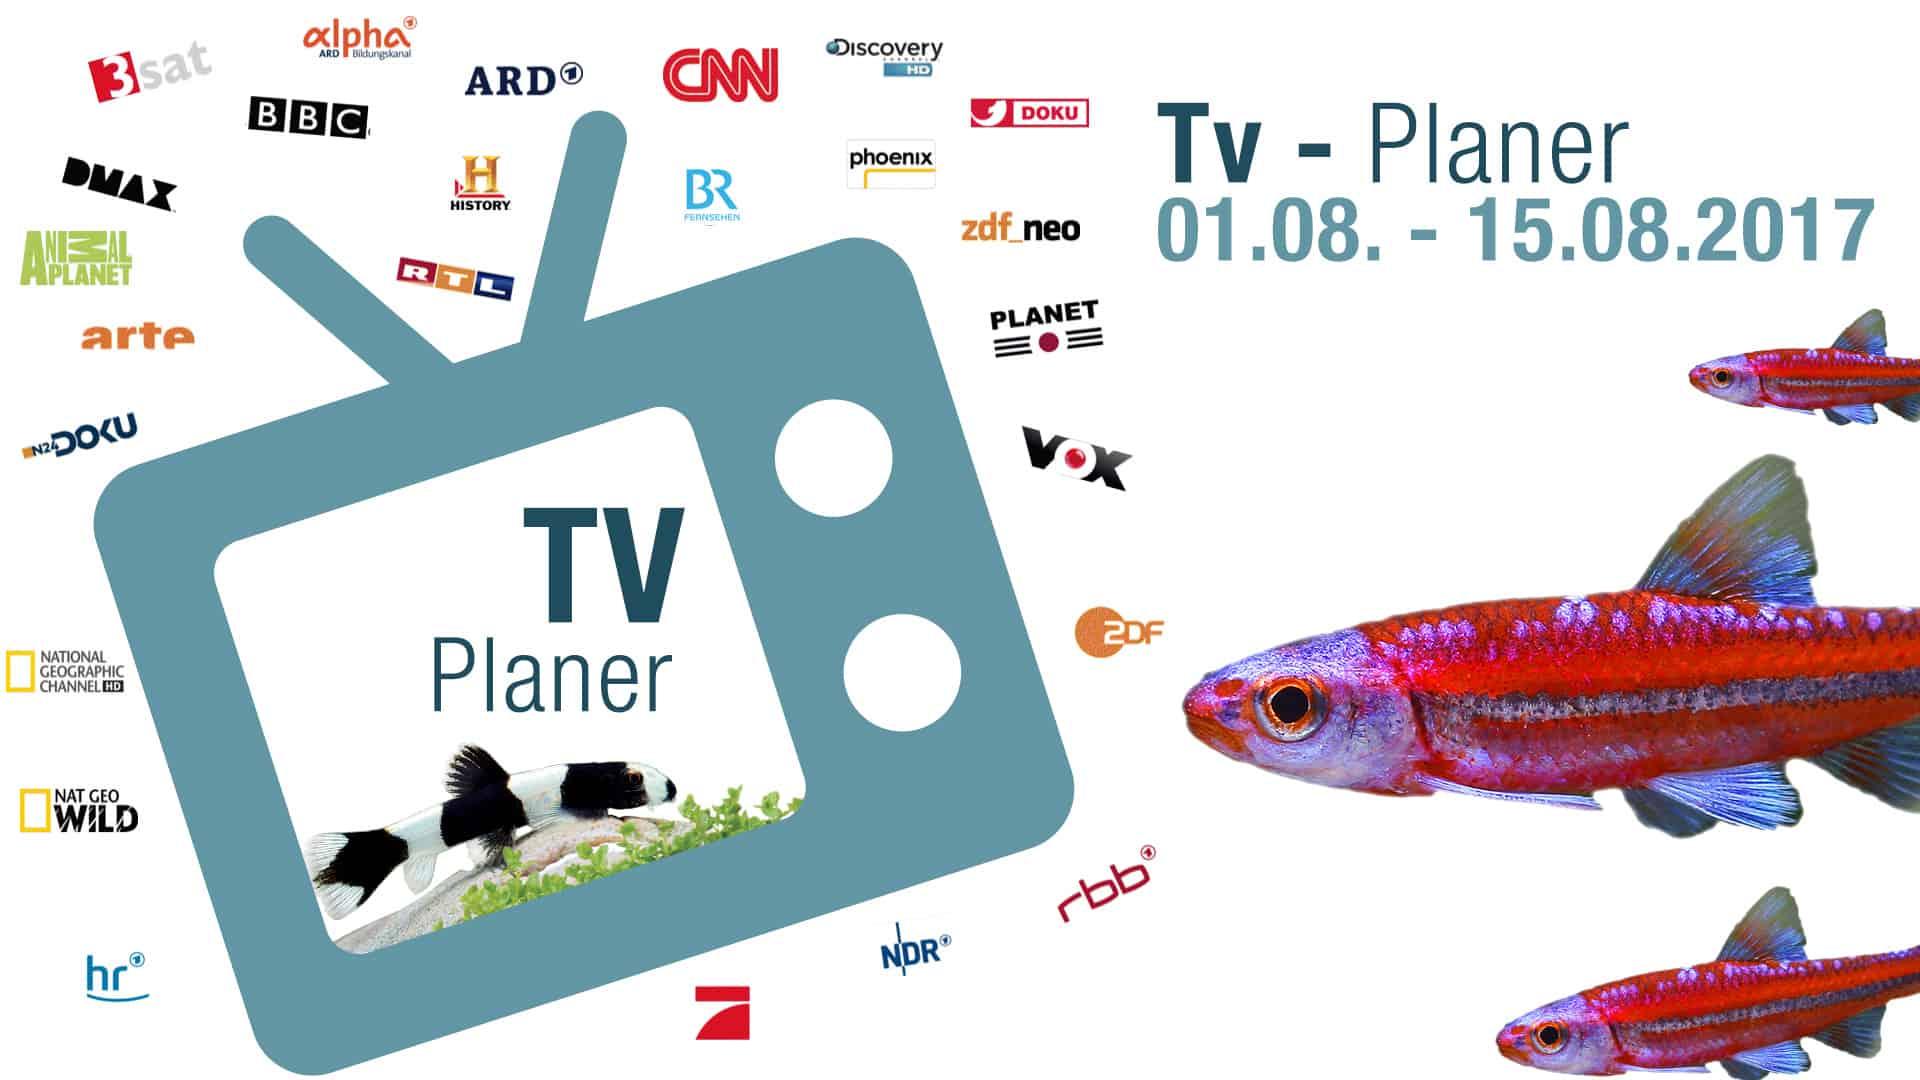 TV-Liste vom 01.08. - 15.08.2017 1